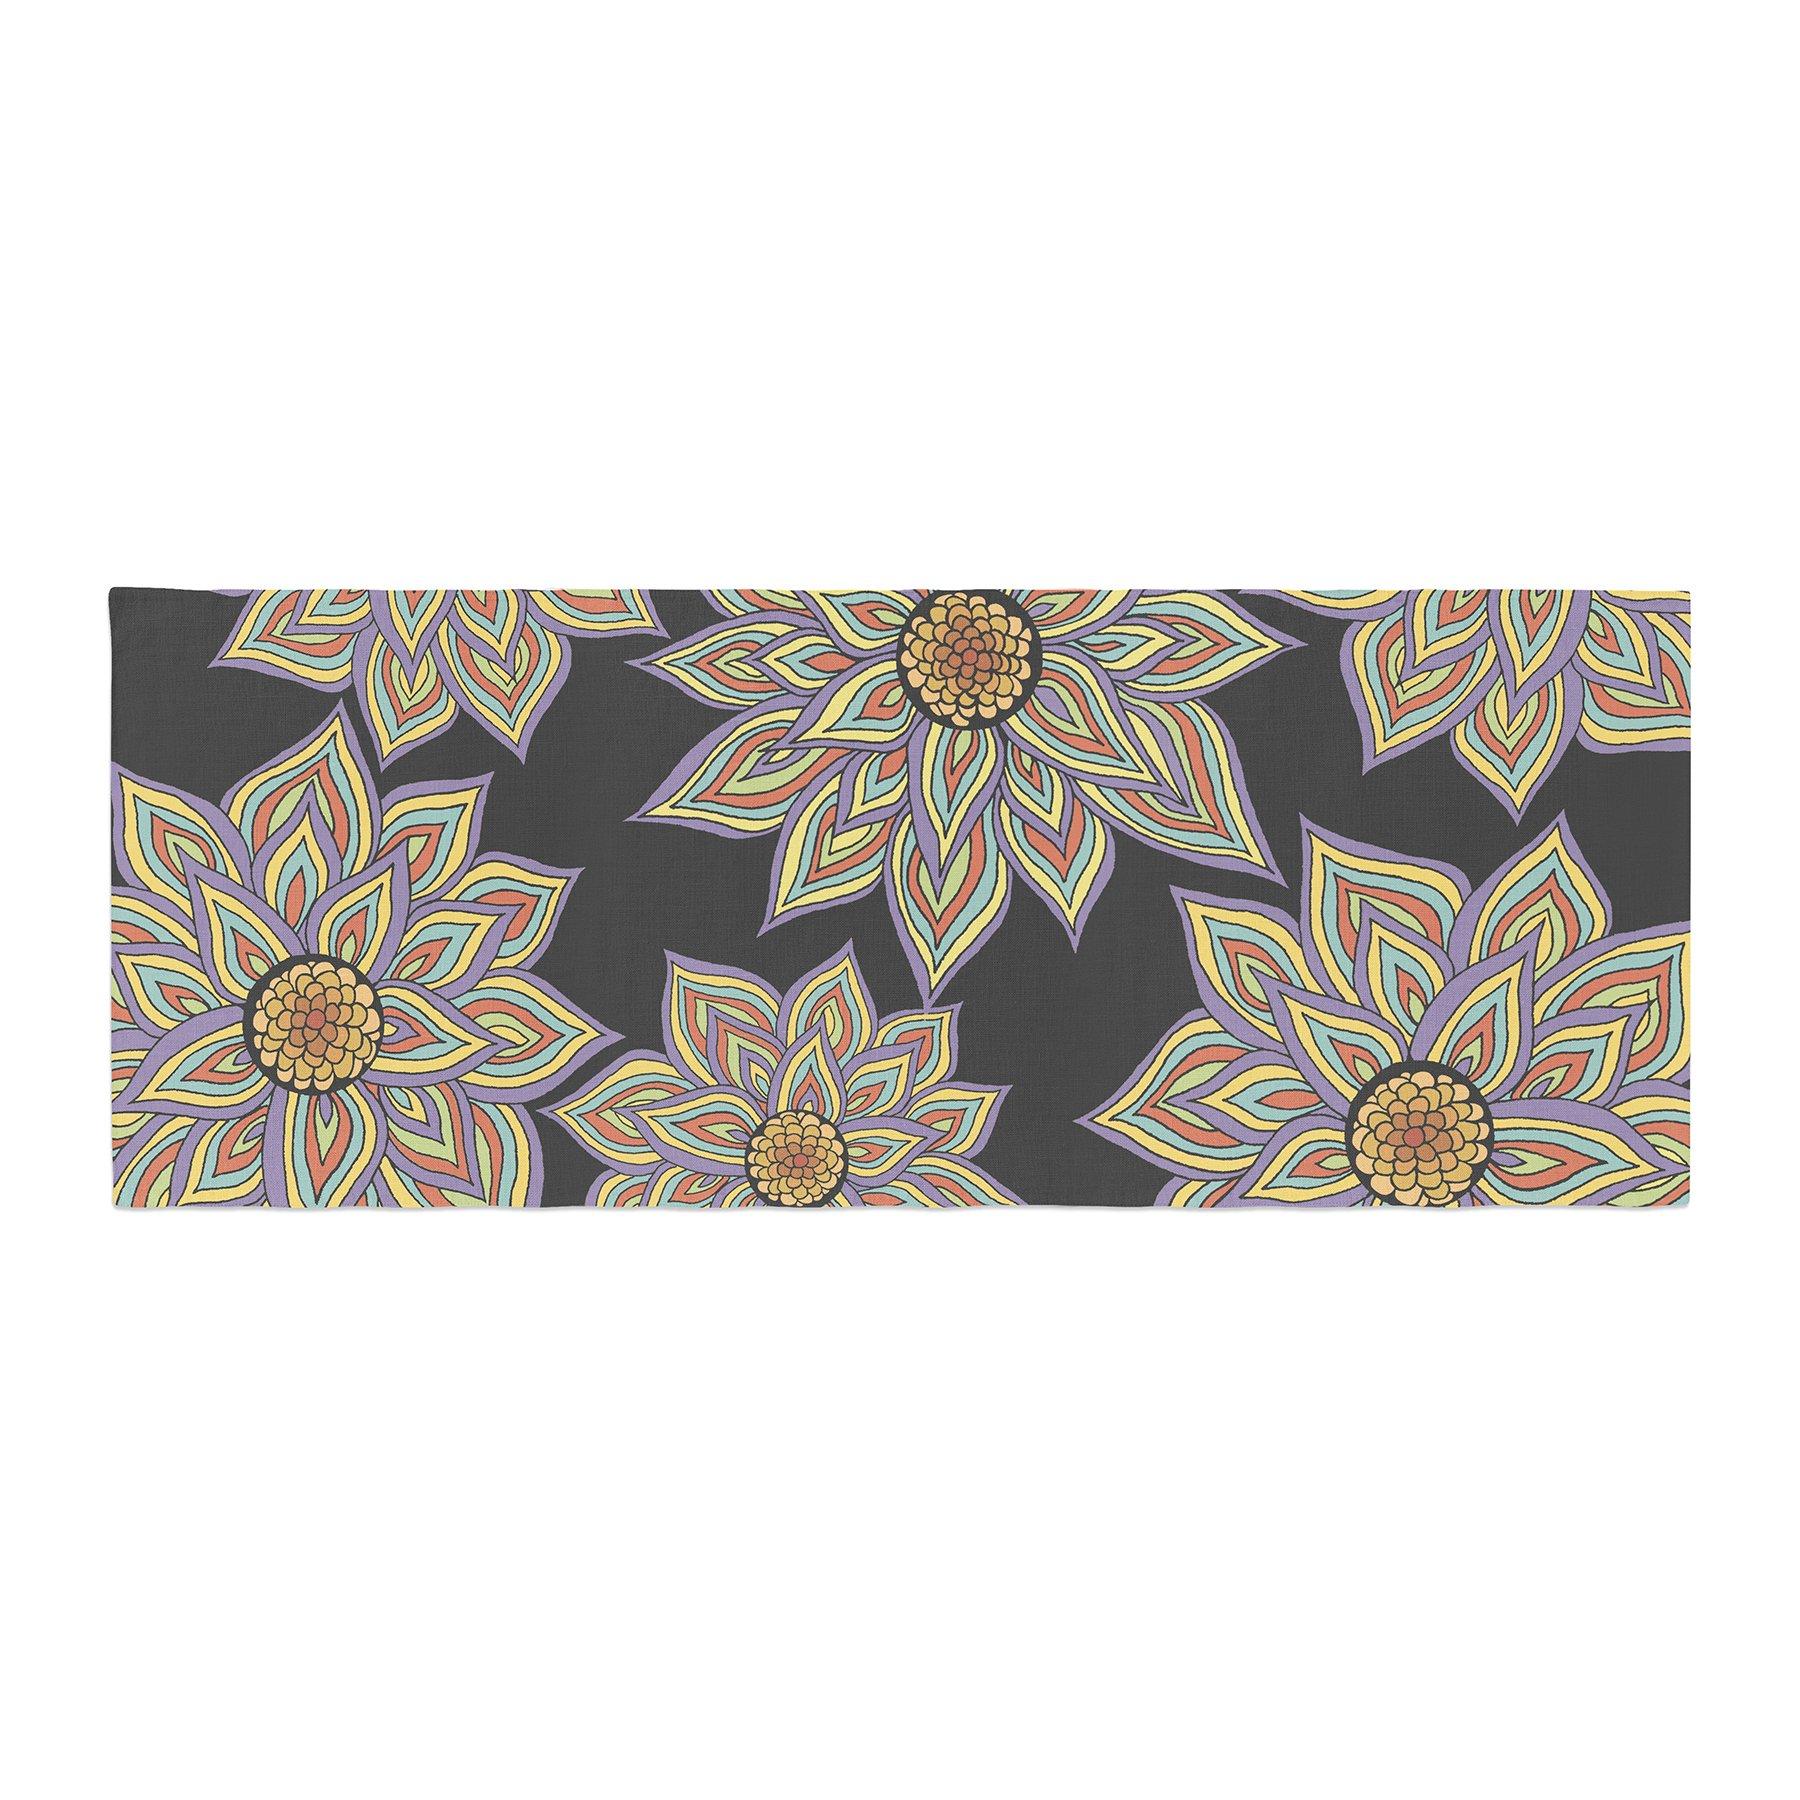 Kess InHouse Pom Graphic Design Floral Dance in the Dark Bed Runner, 34'' x 86''